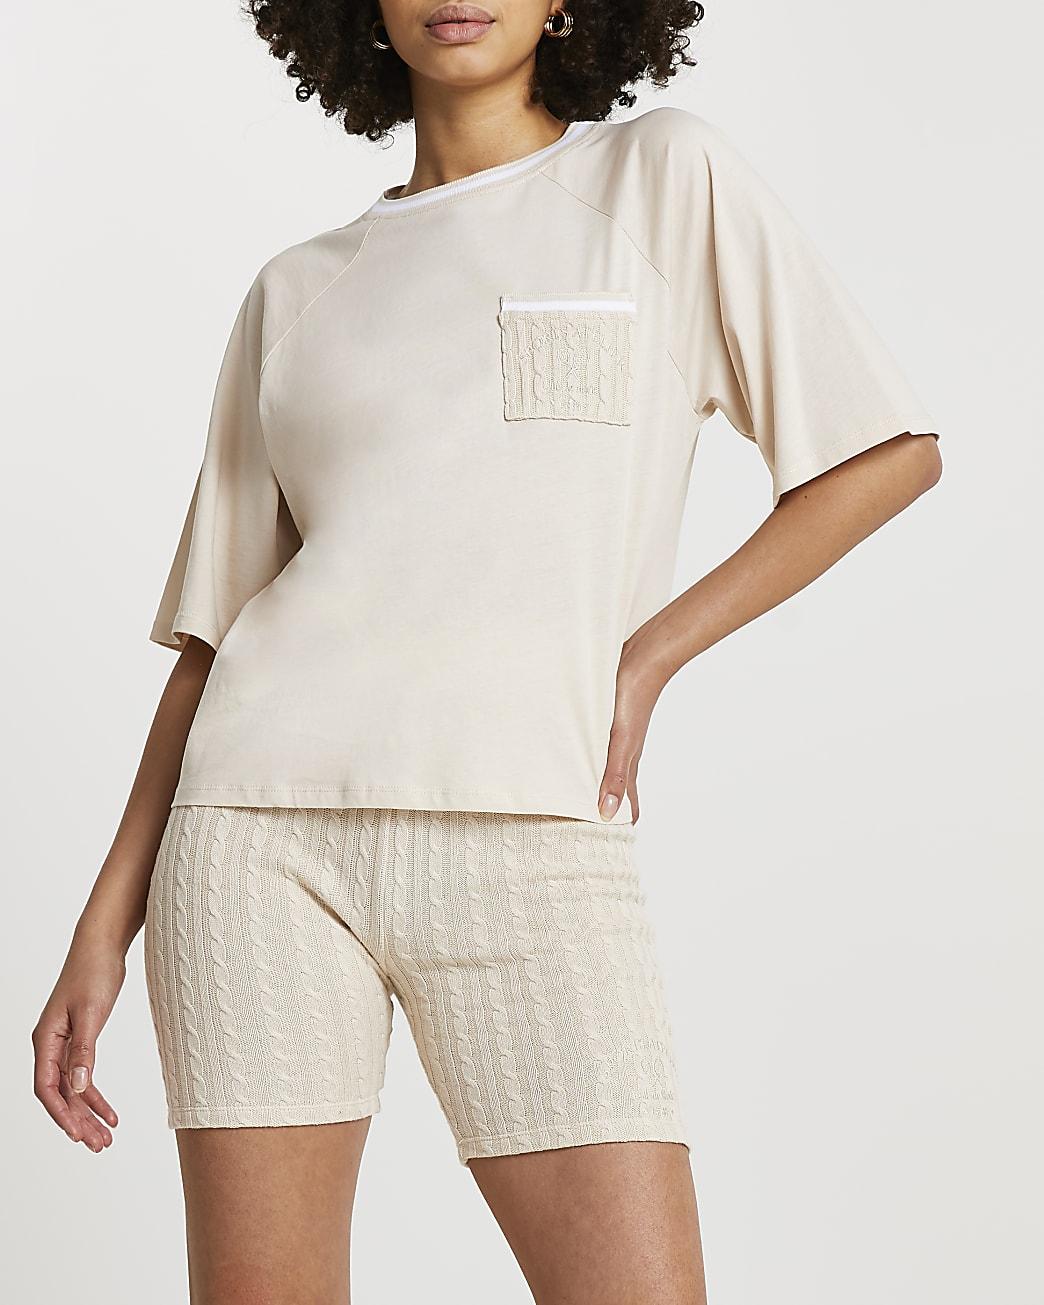 Beige boxy crop short sleeve tennis t-shirt